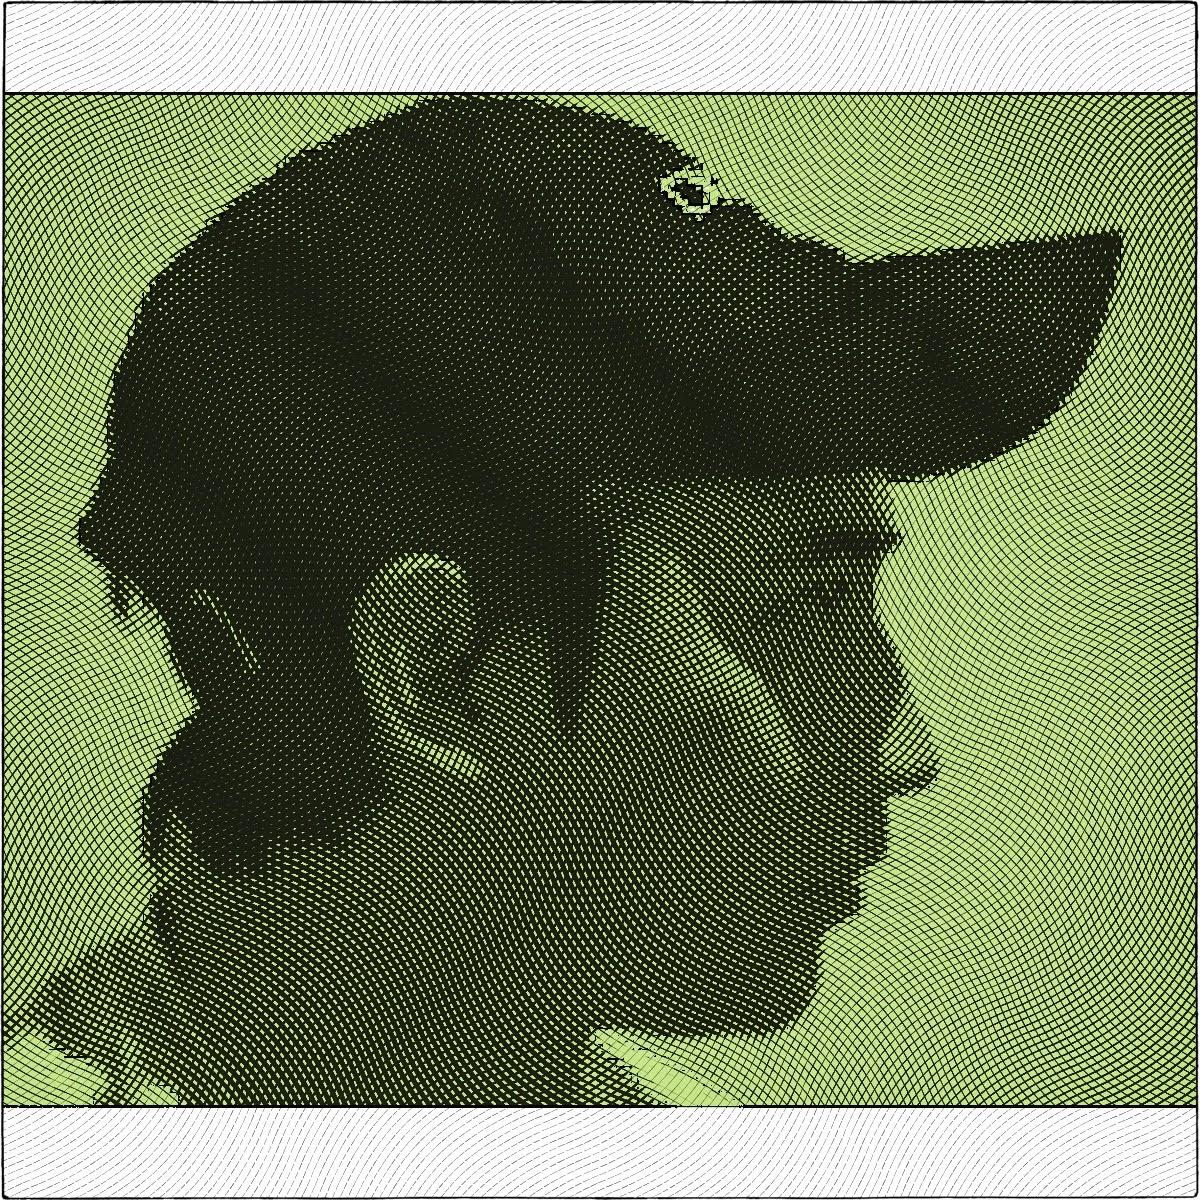 Toper Domingo